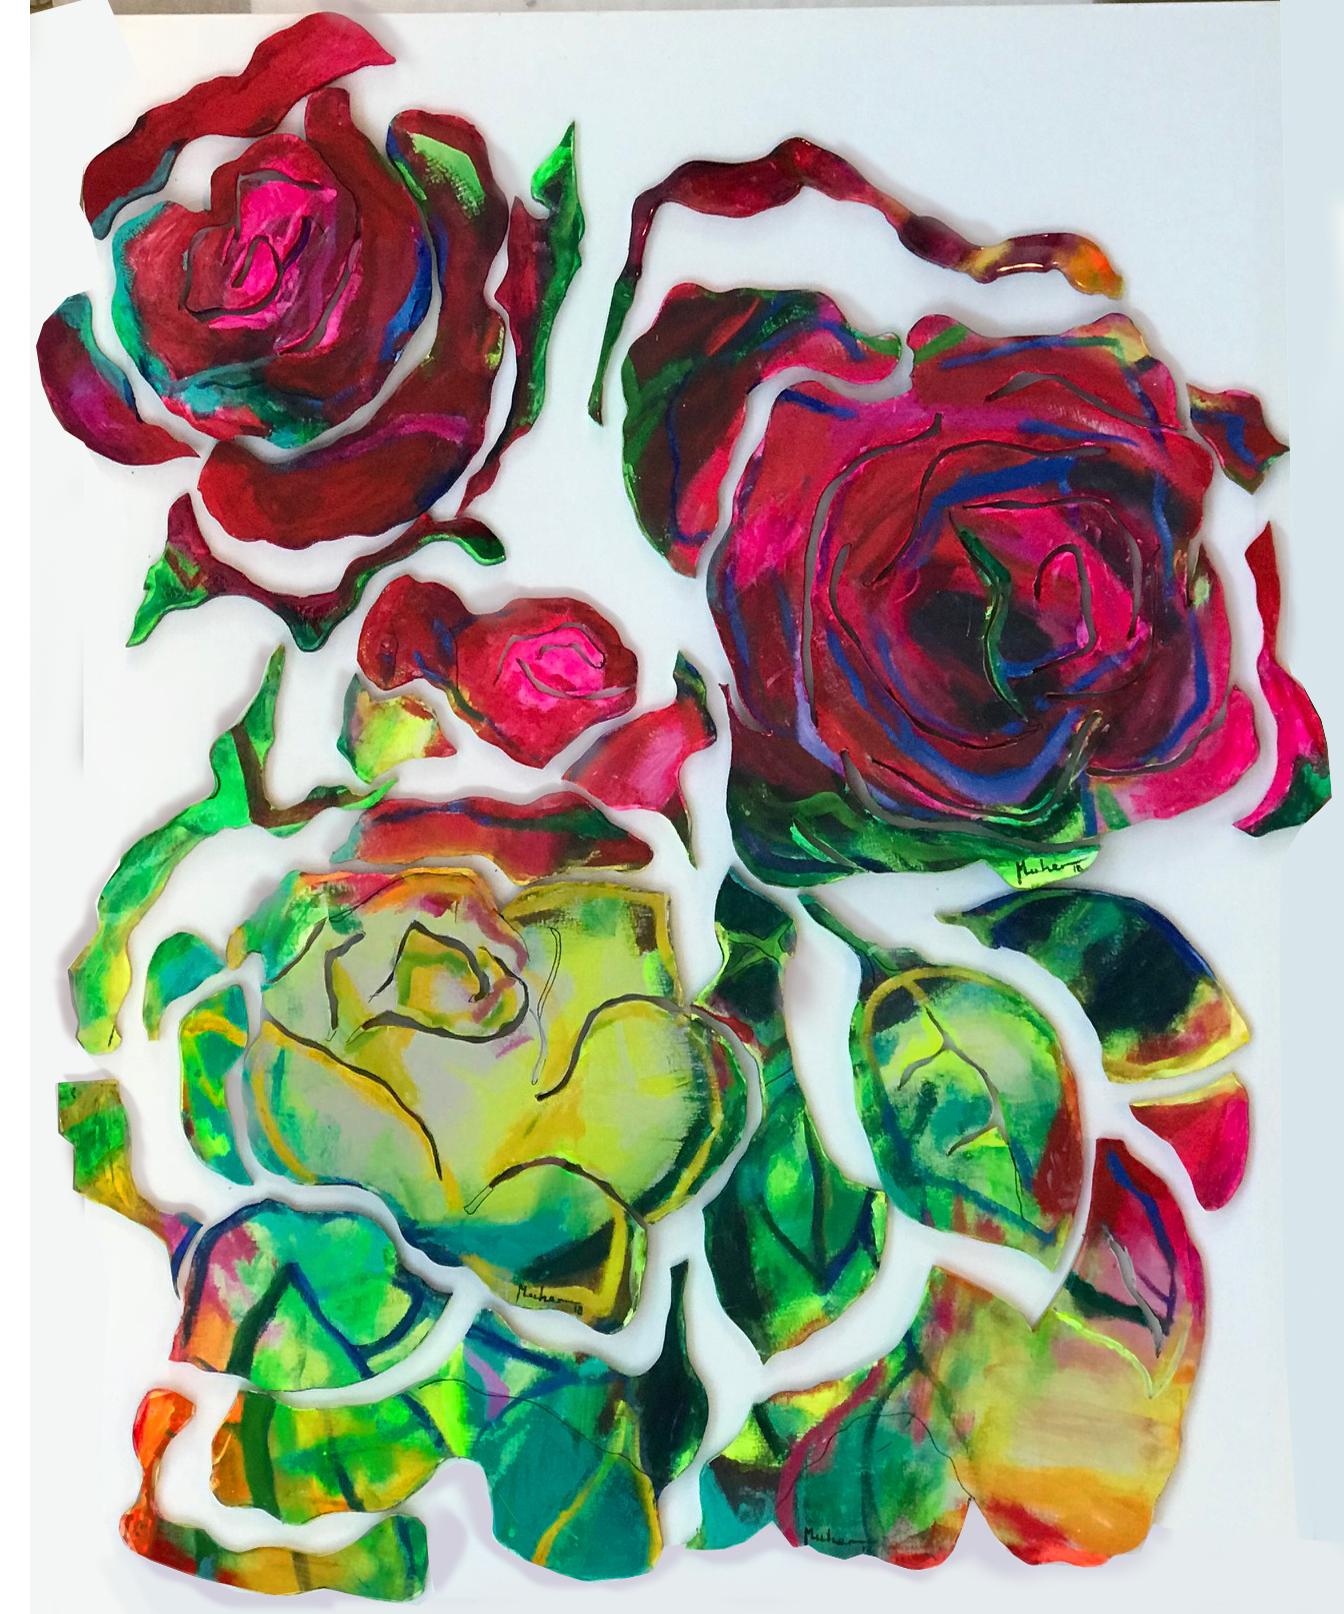 grupo de rosas deconstruidas . obra tecnica mixta . acrliico y resina sobre madera